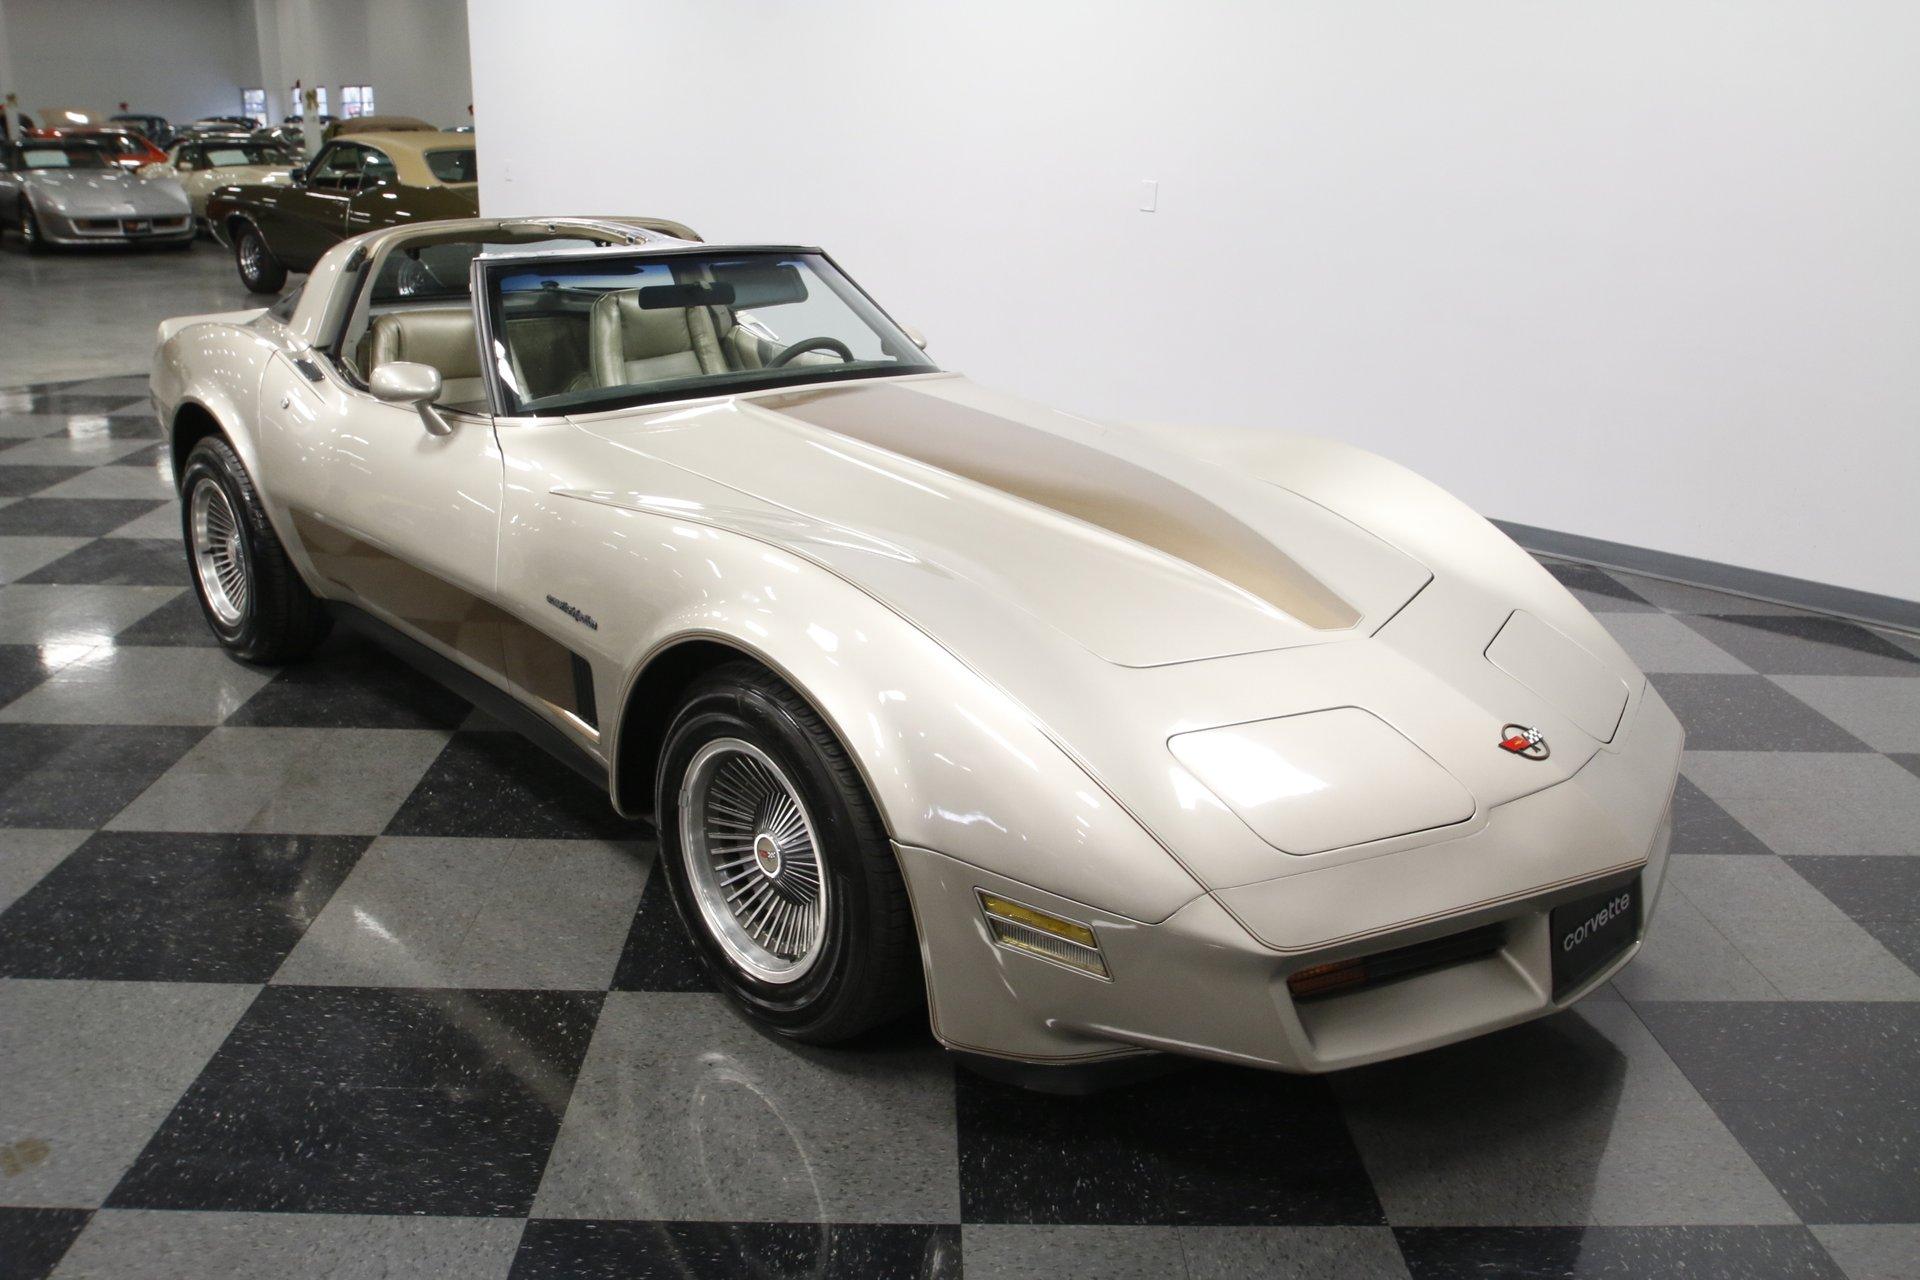 1982 Chevrolet Corvette | Streetside Classics - The Nation's Trusted